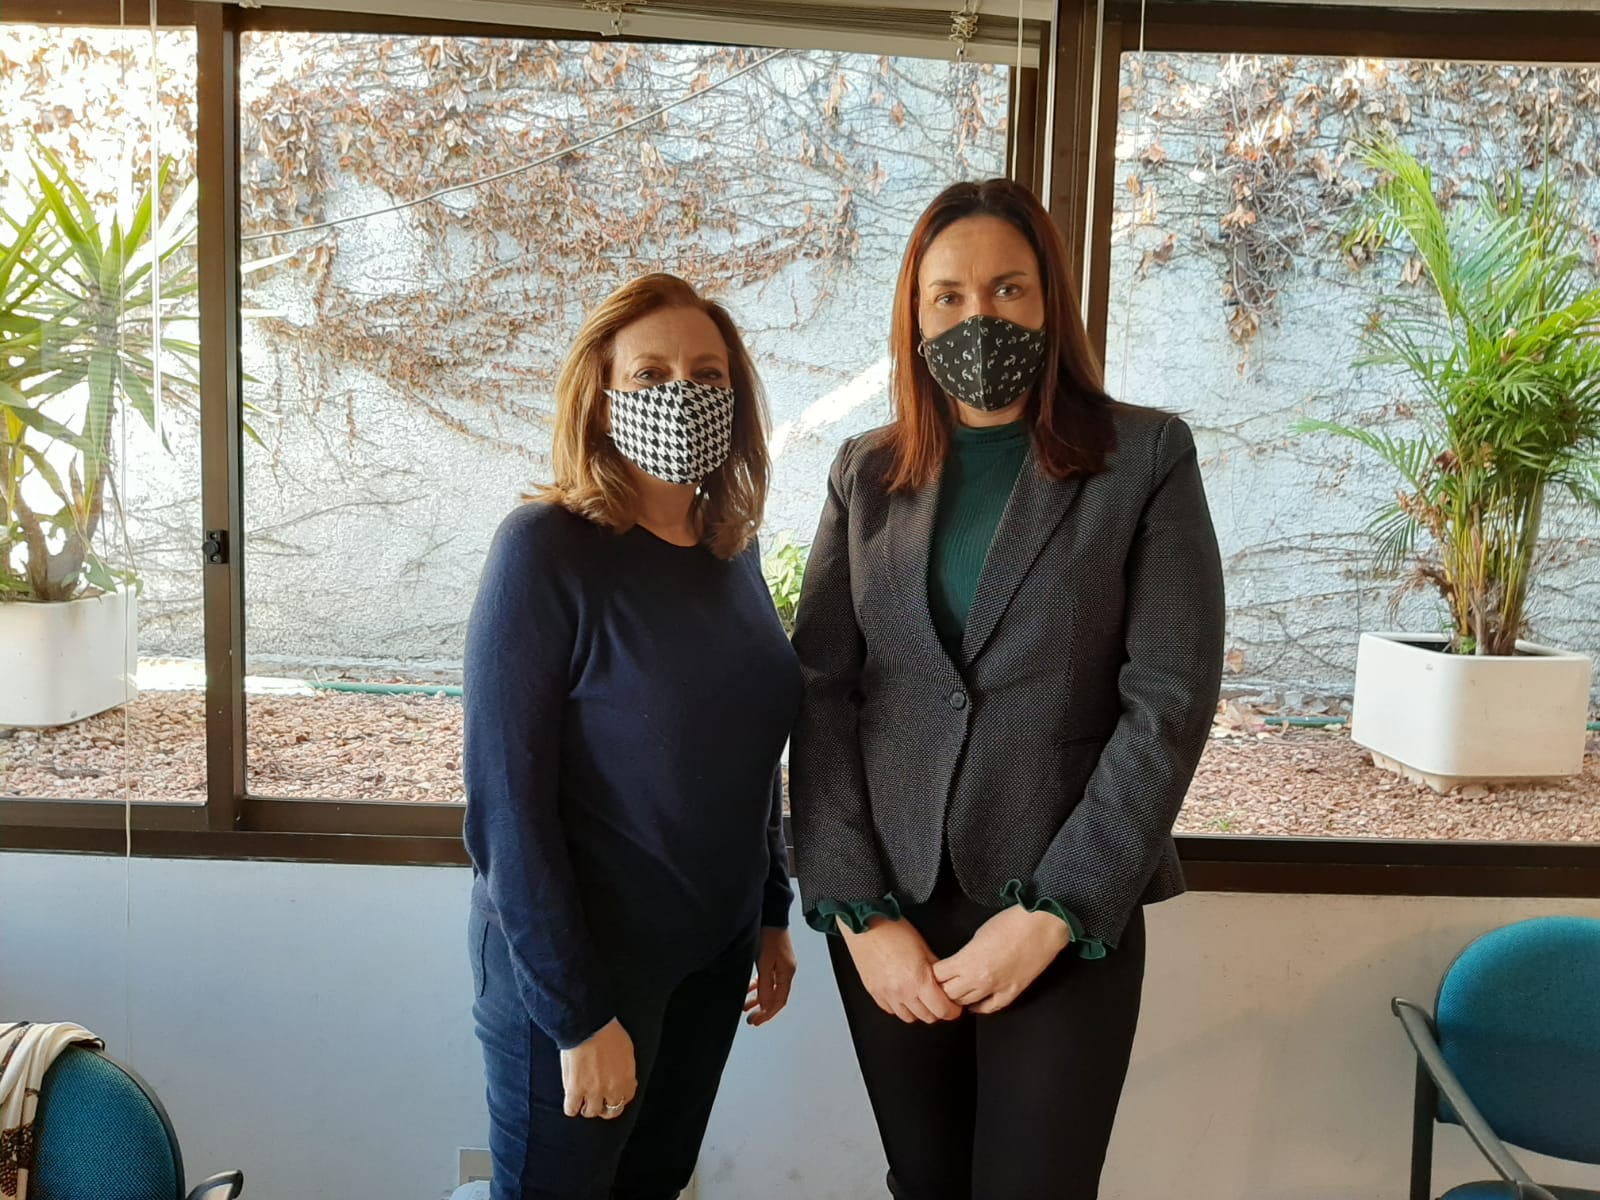 Mónica Botero de INMUJERES y María de Lima de OPP